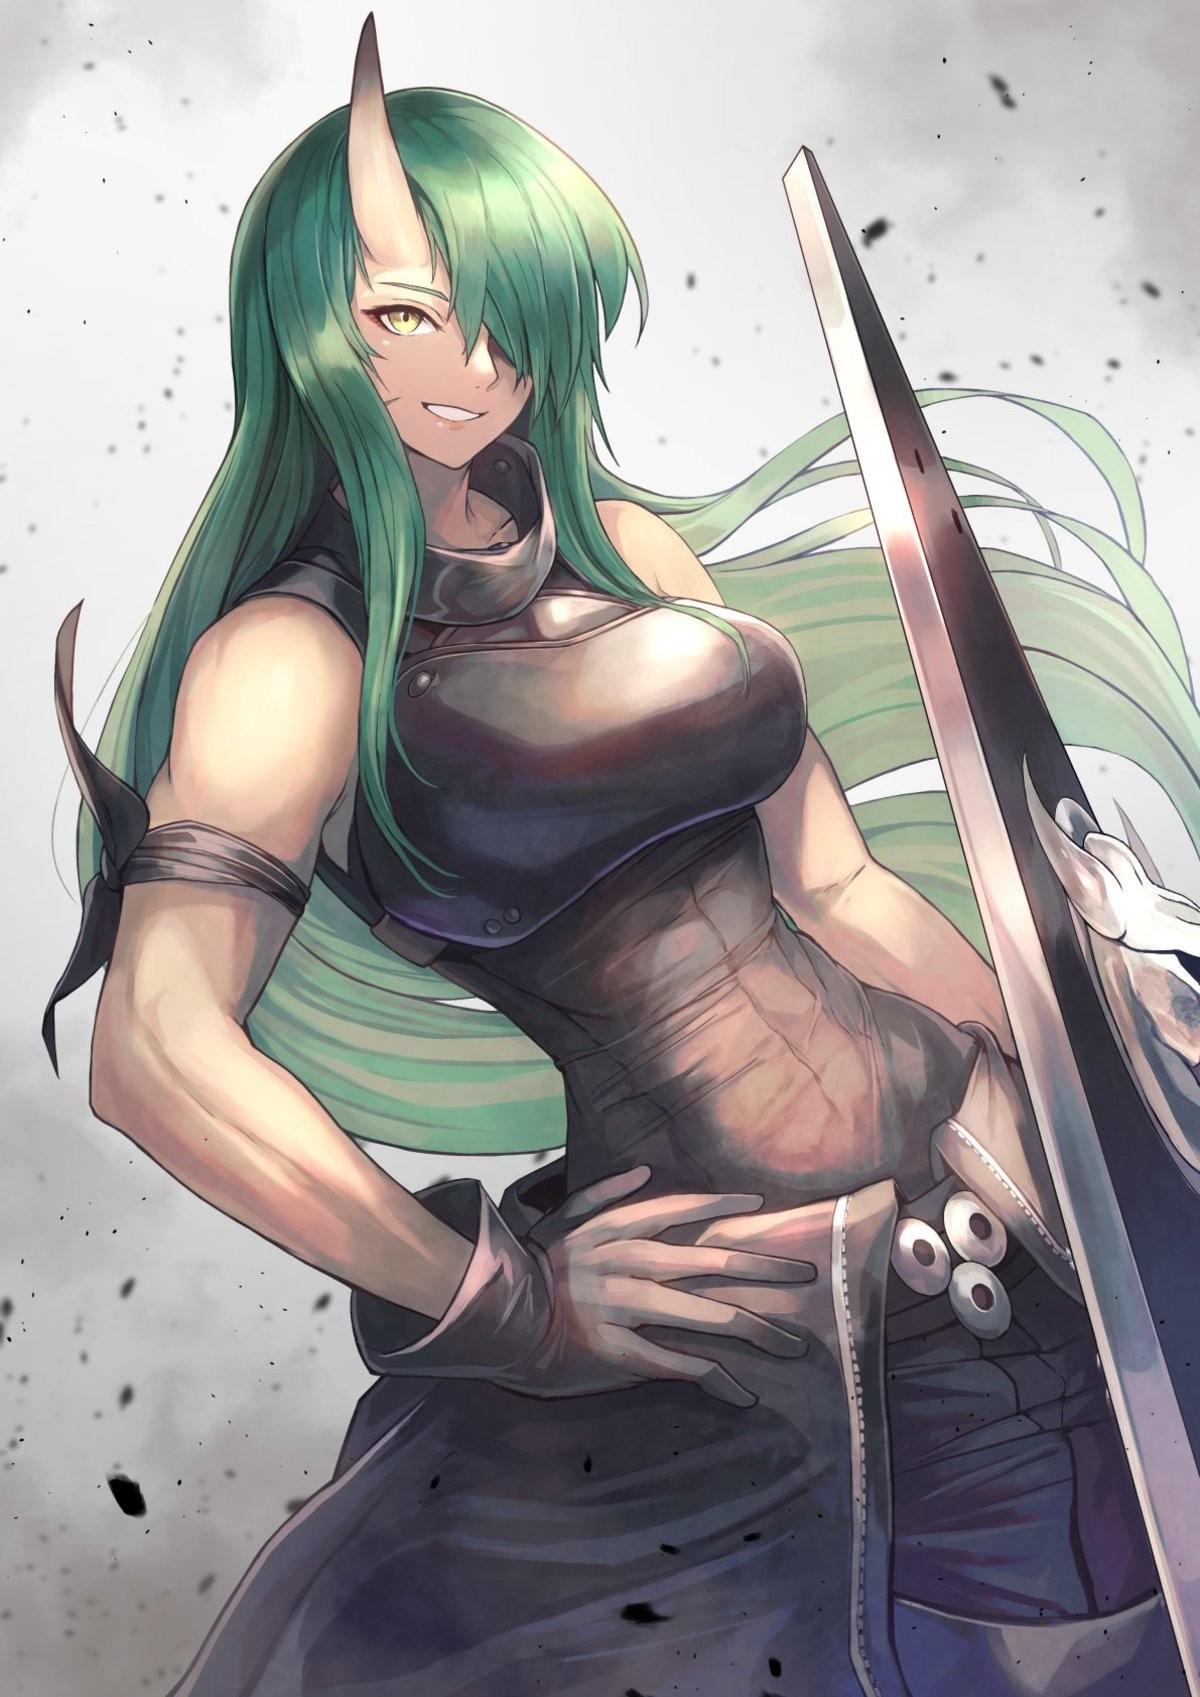 Hoshiguma's -abs- smile. .. >tfw no heroic tol oni gf What's the point, fellas?